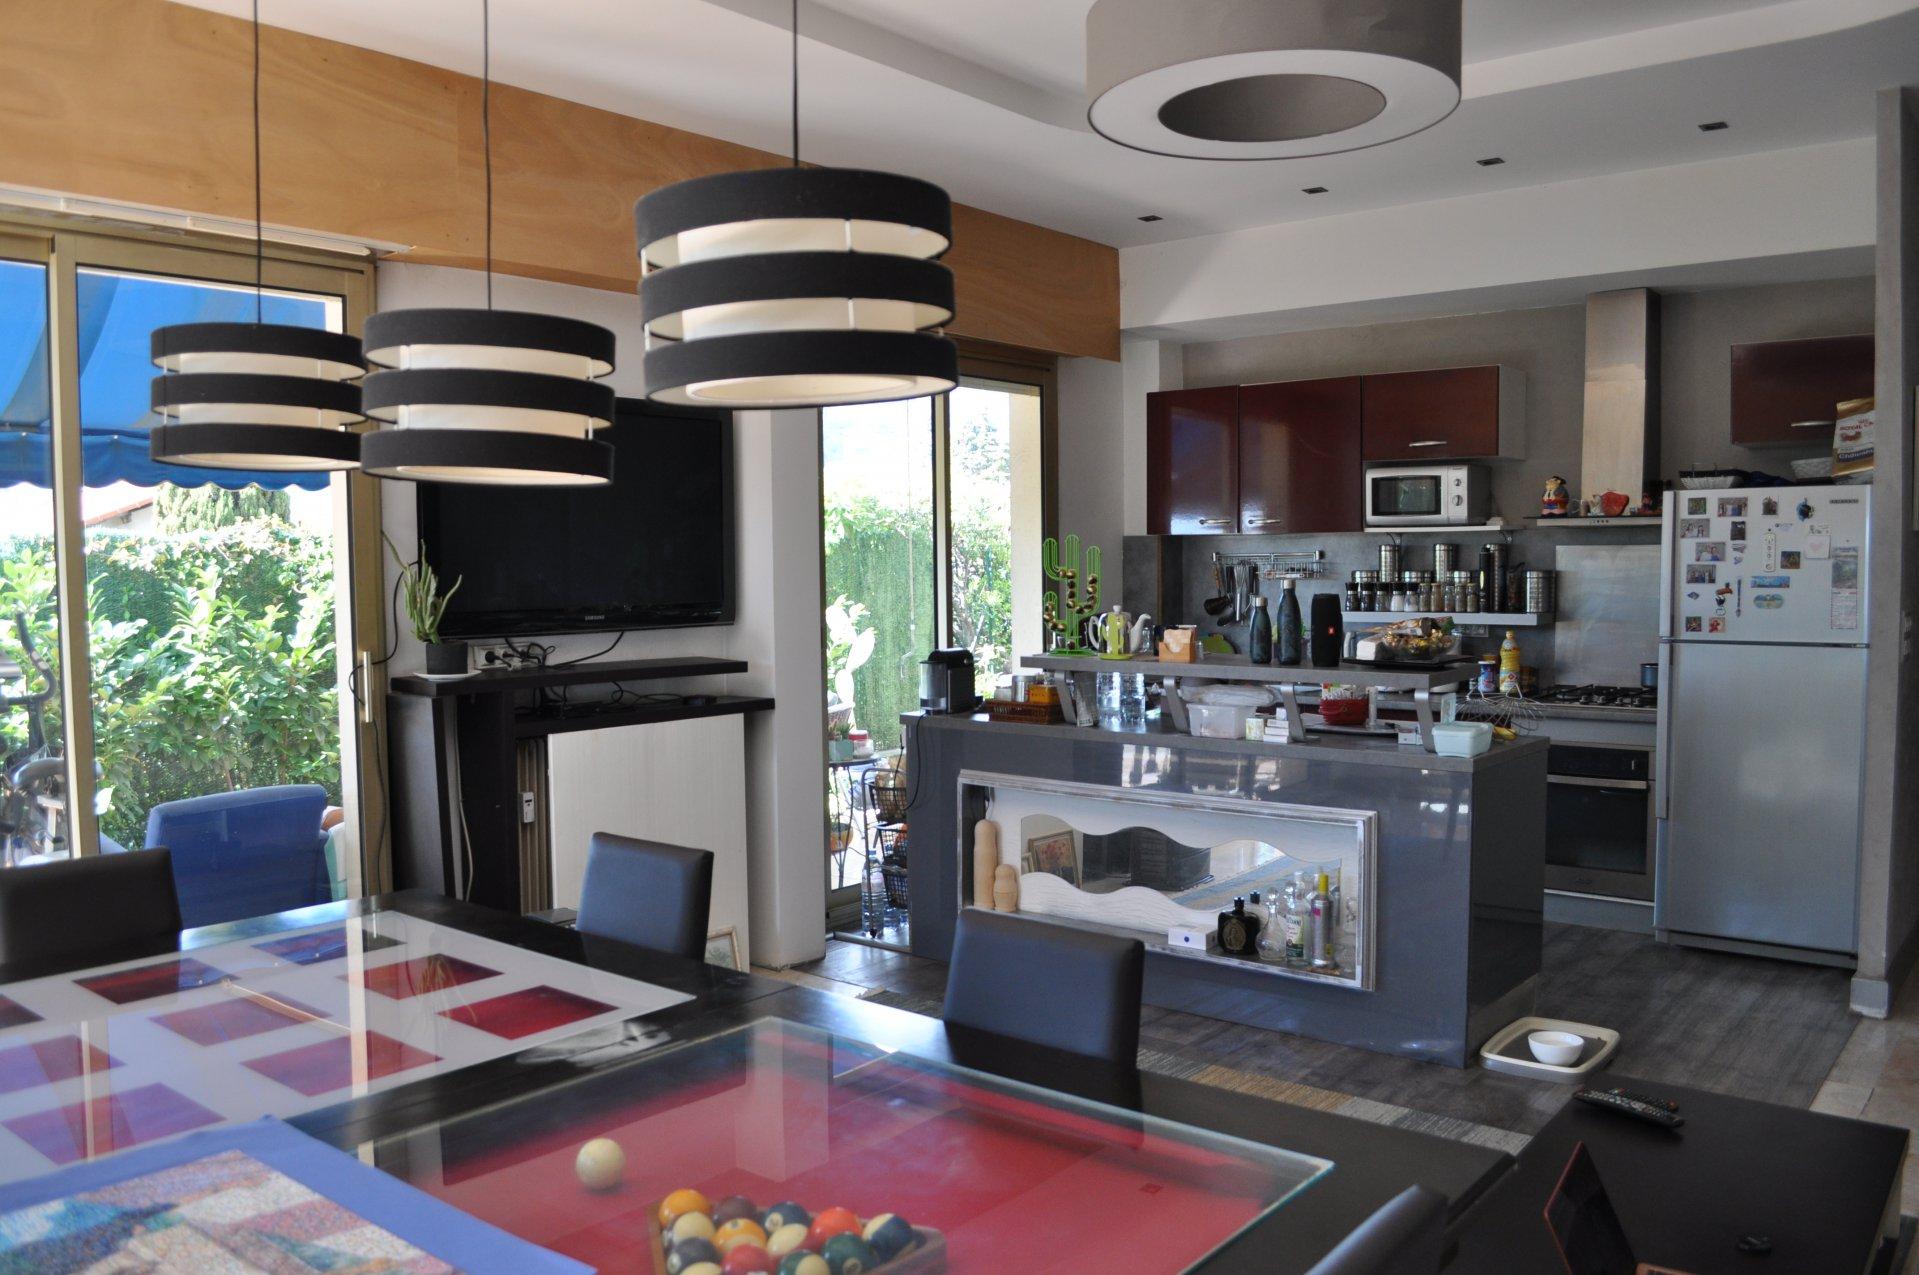 Acciaio Inox, cucina a isola